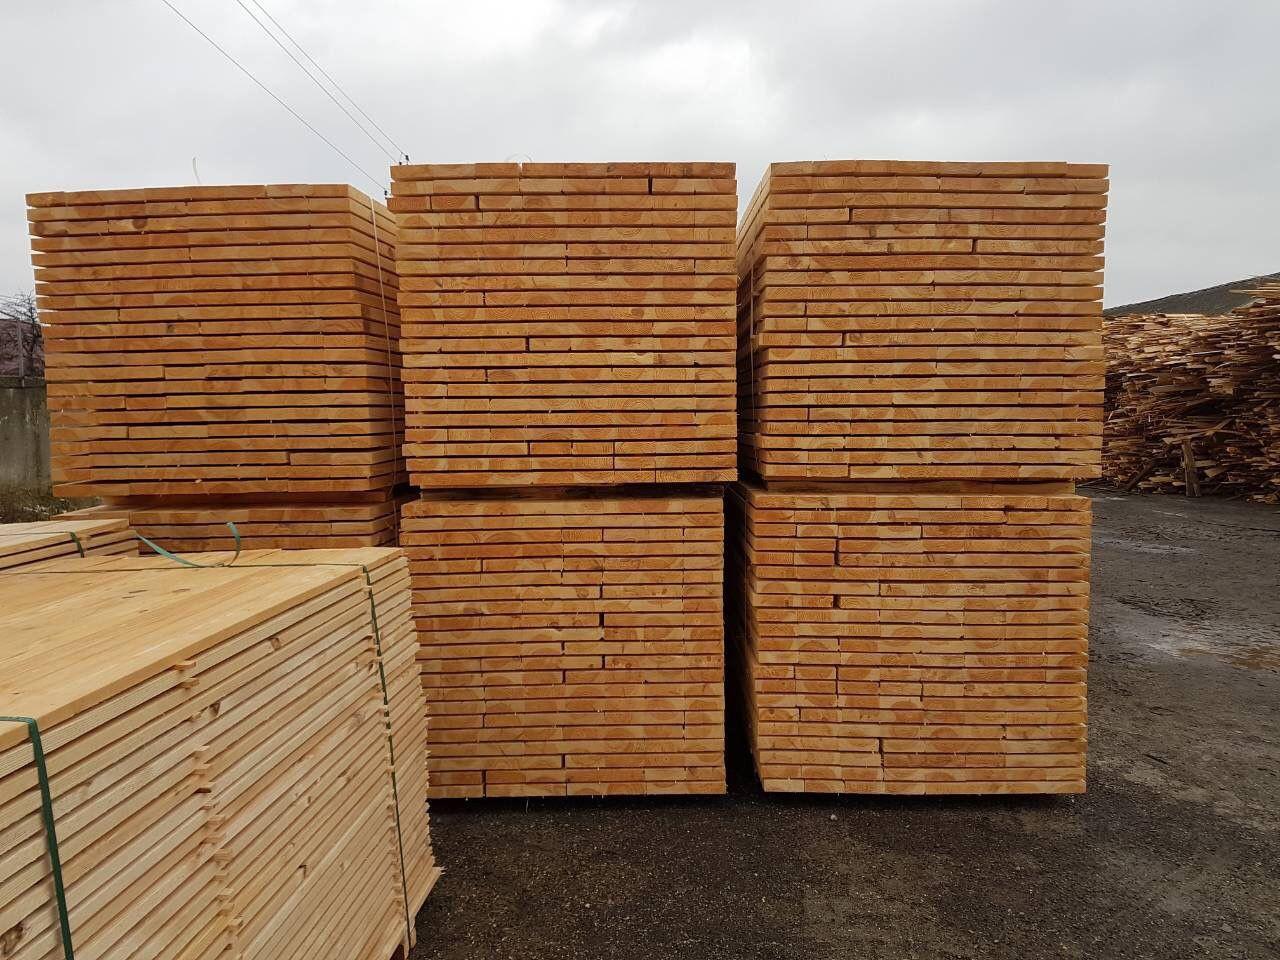 Pine sawn timber - lumber of any sizes